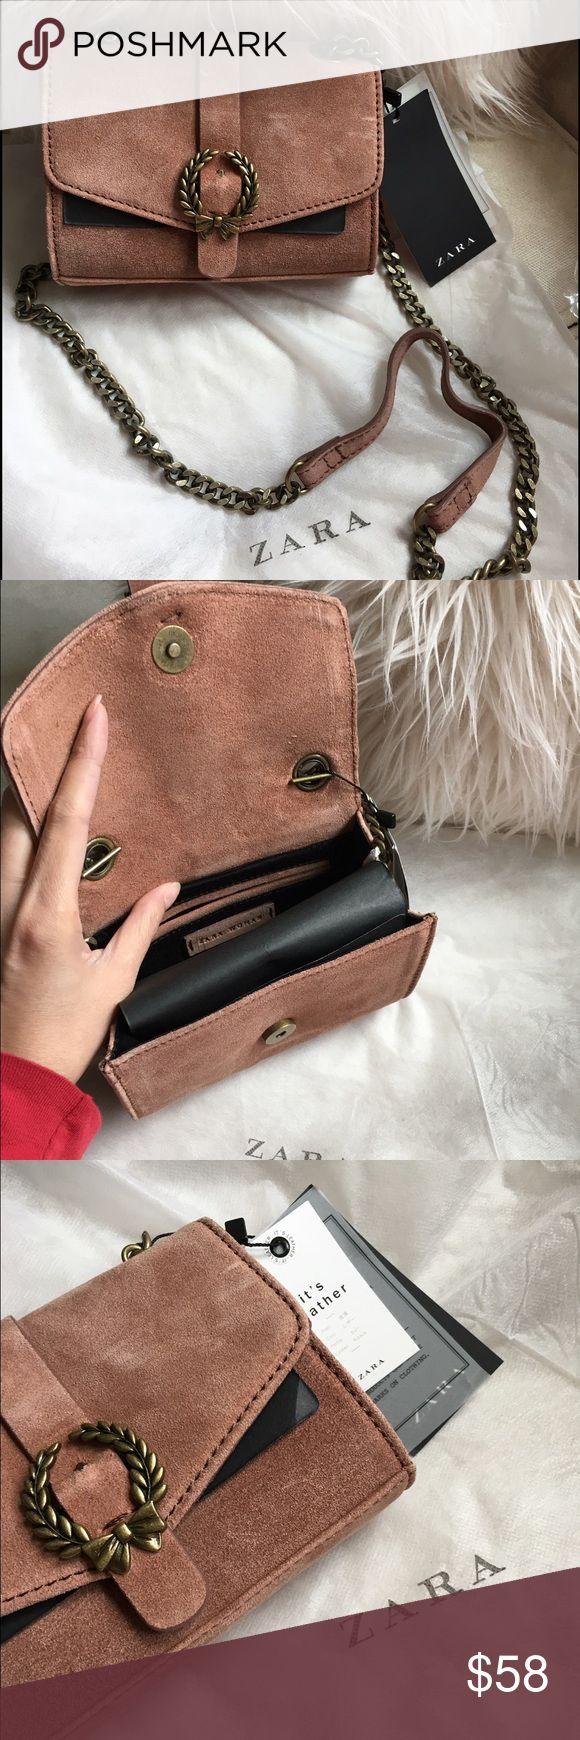 Zara Leather Crossbody Bag NEW ;;; NEVER BEEN WORN Zara Bags Crossbody Bags